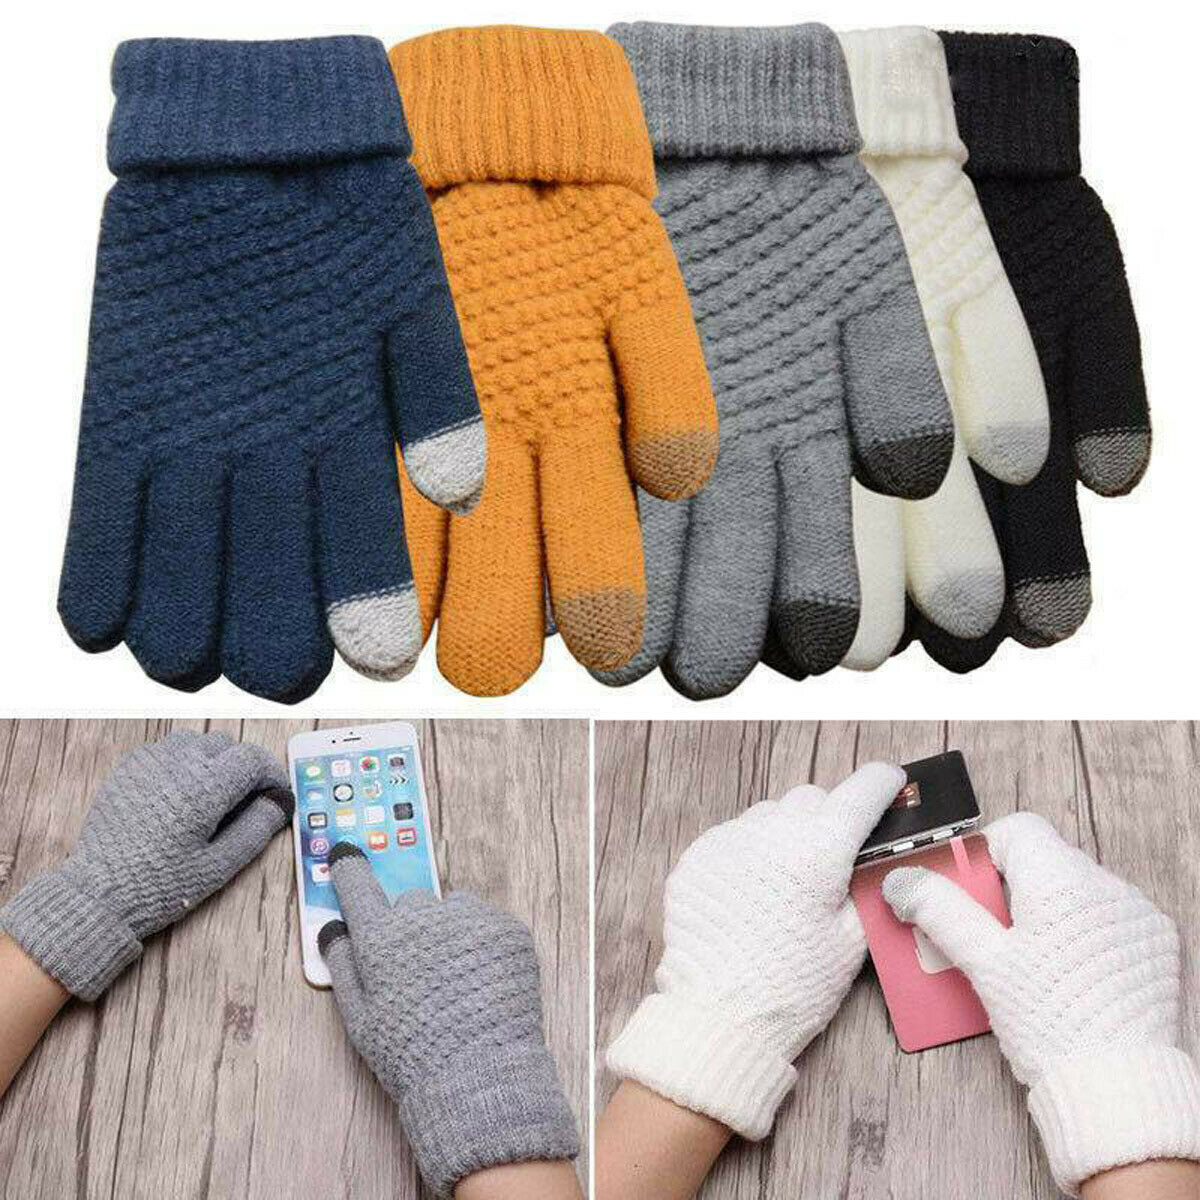 Unisex Men Women Classic Gloves Touch Screen Winter Warm Wool Knitted Plain